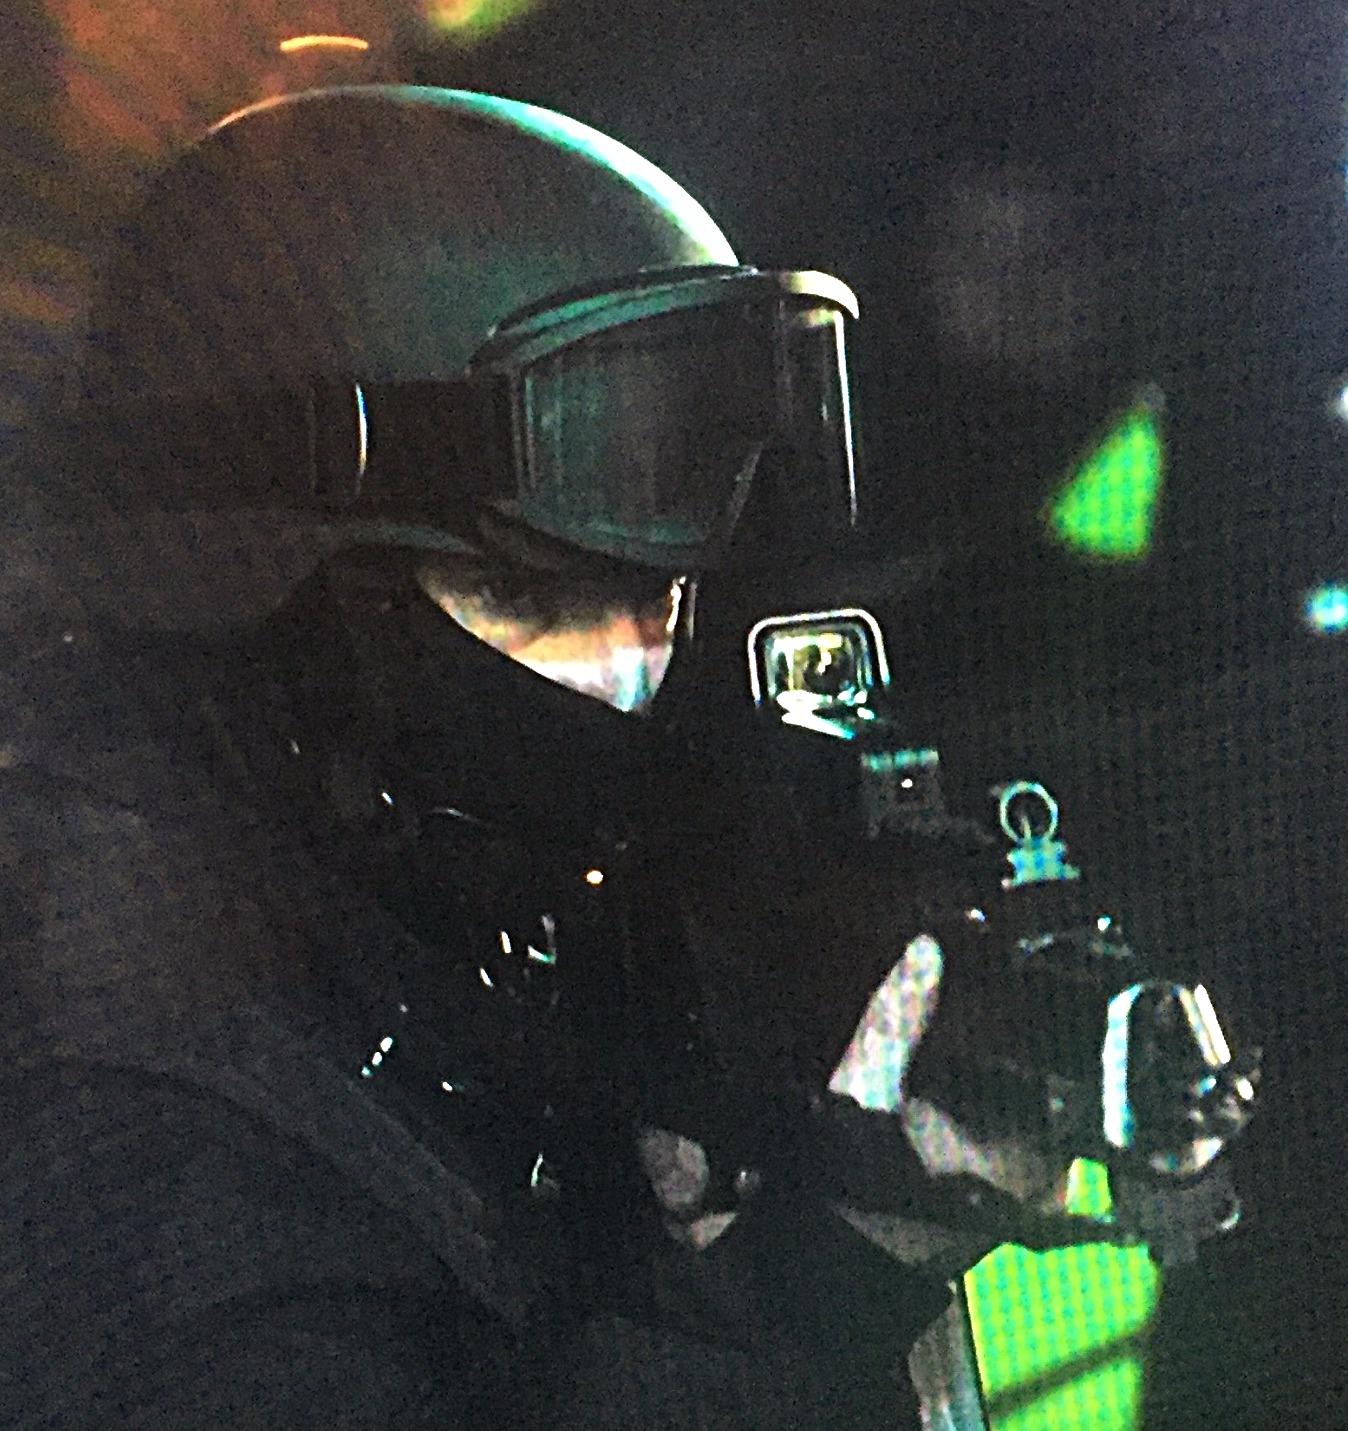 Armed GG_edited